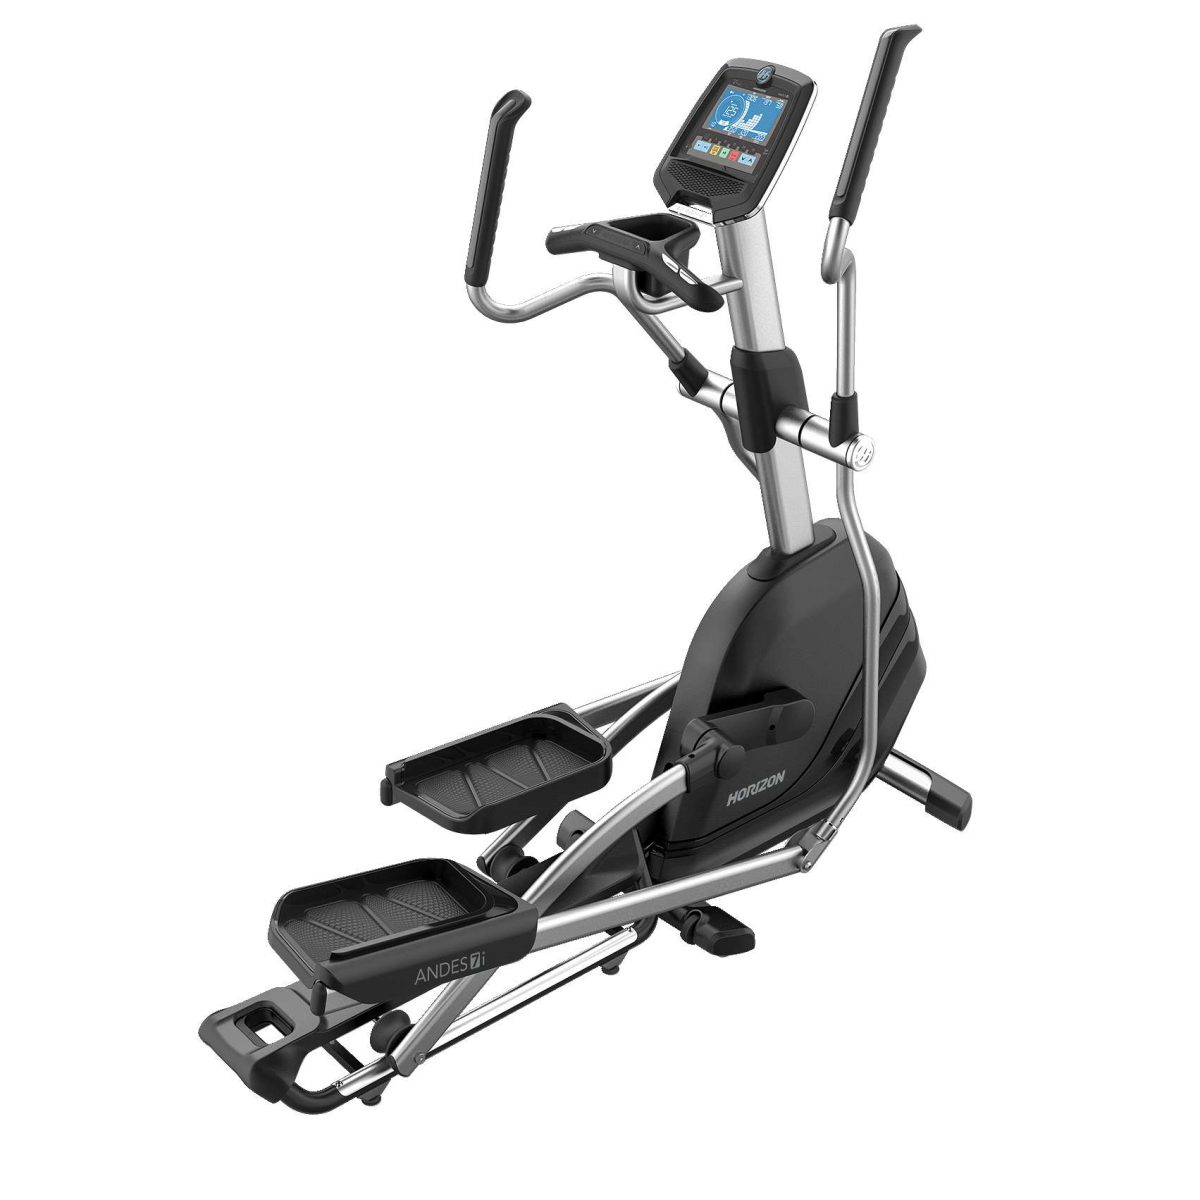 "Horizon Fitness Crosstrainer ""Andes 7i"" - Fitnessgeräte - Horizon Fitness"